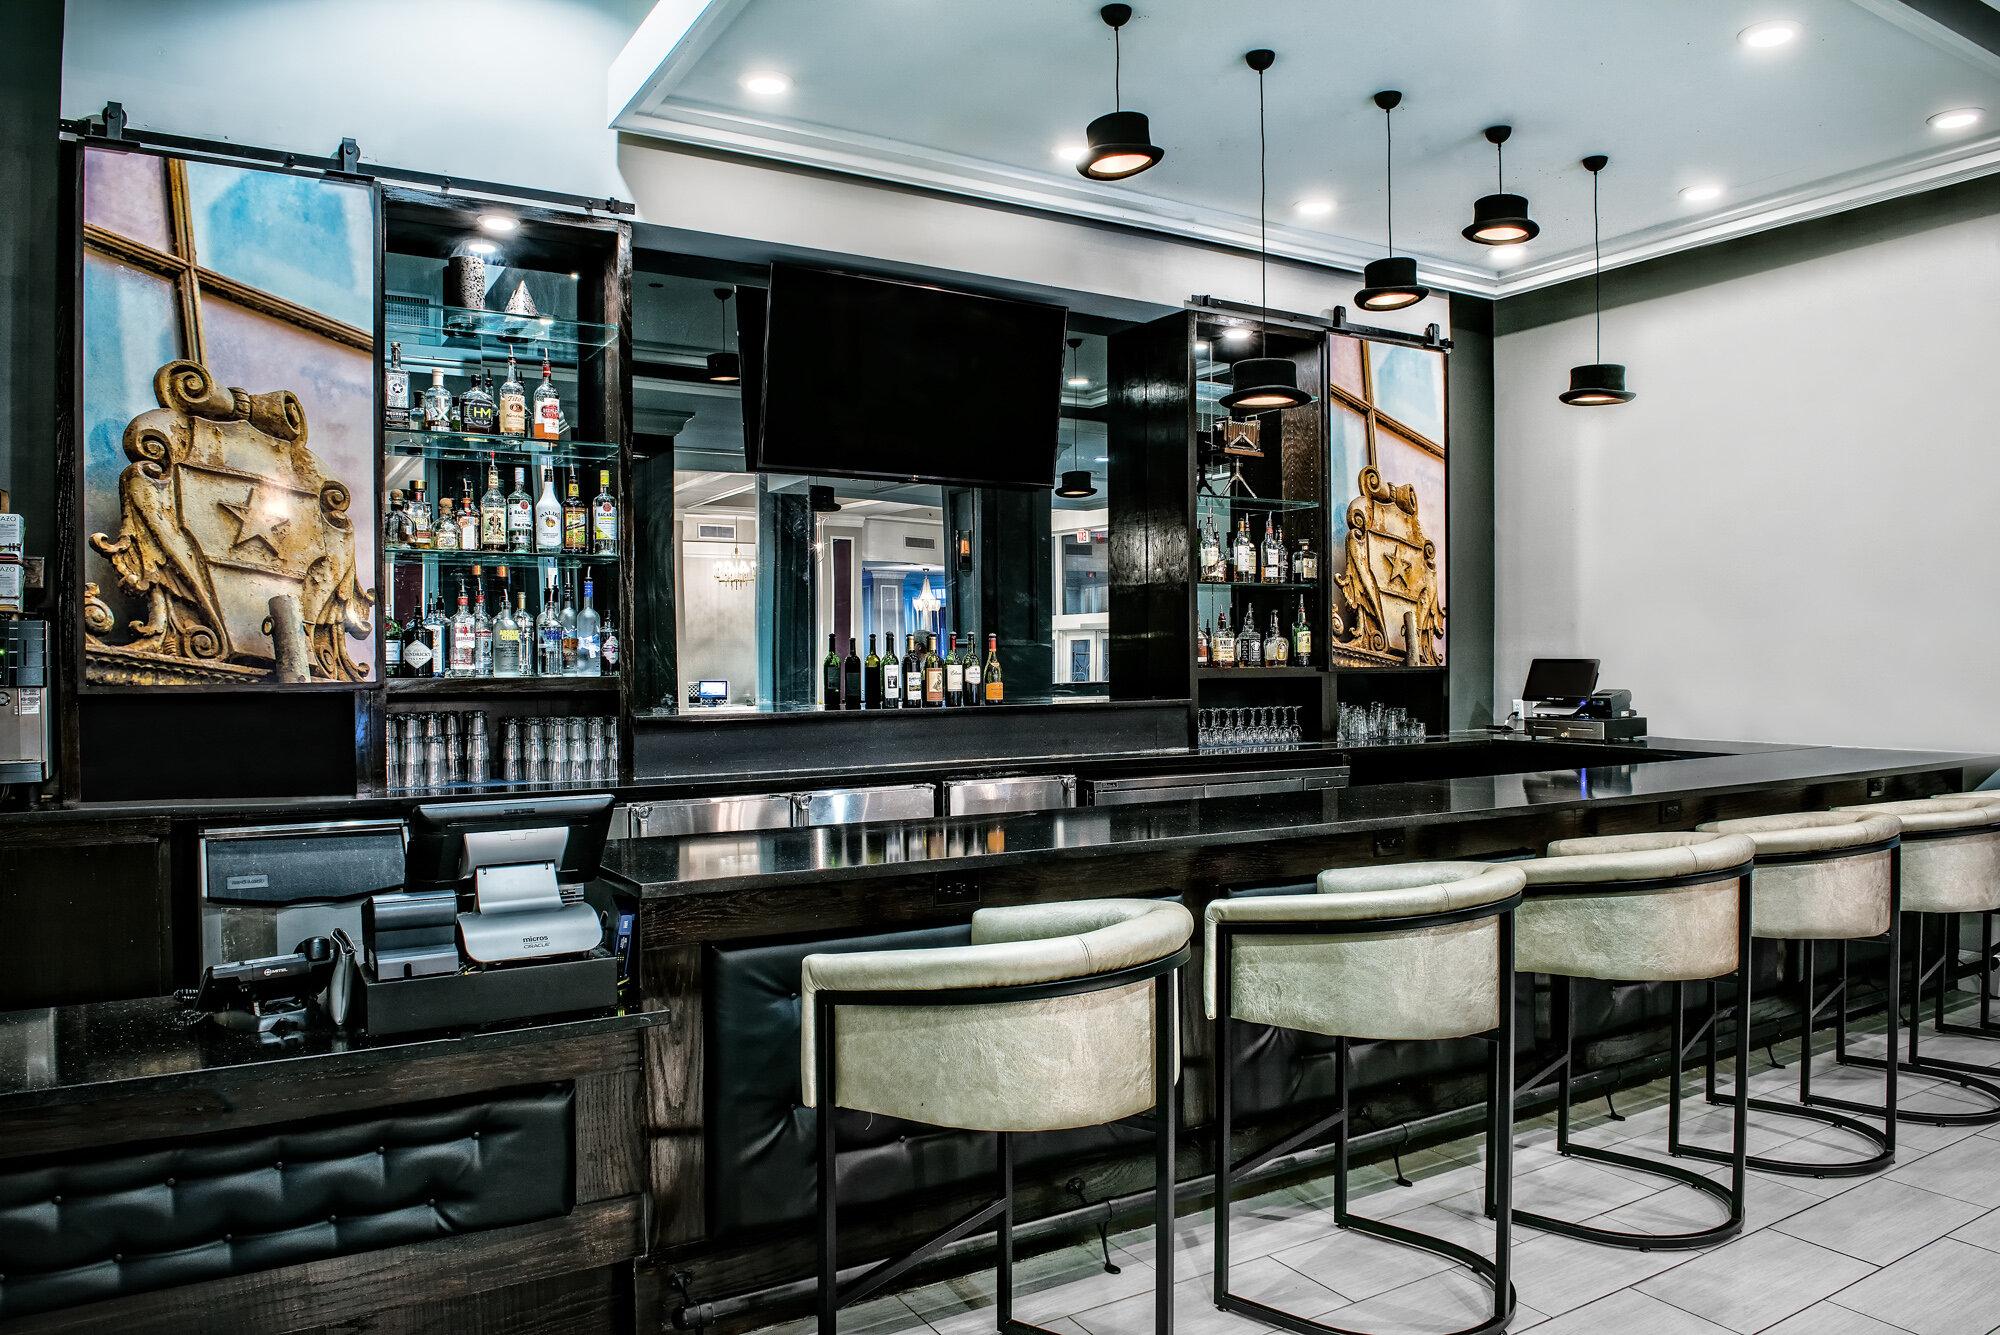 dalar-hotel-indigo-dallas-downtown-bar-low res.jpg